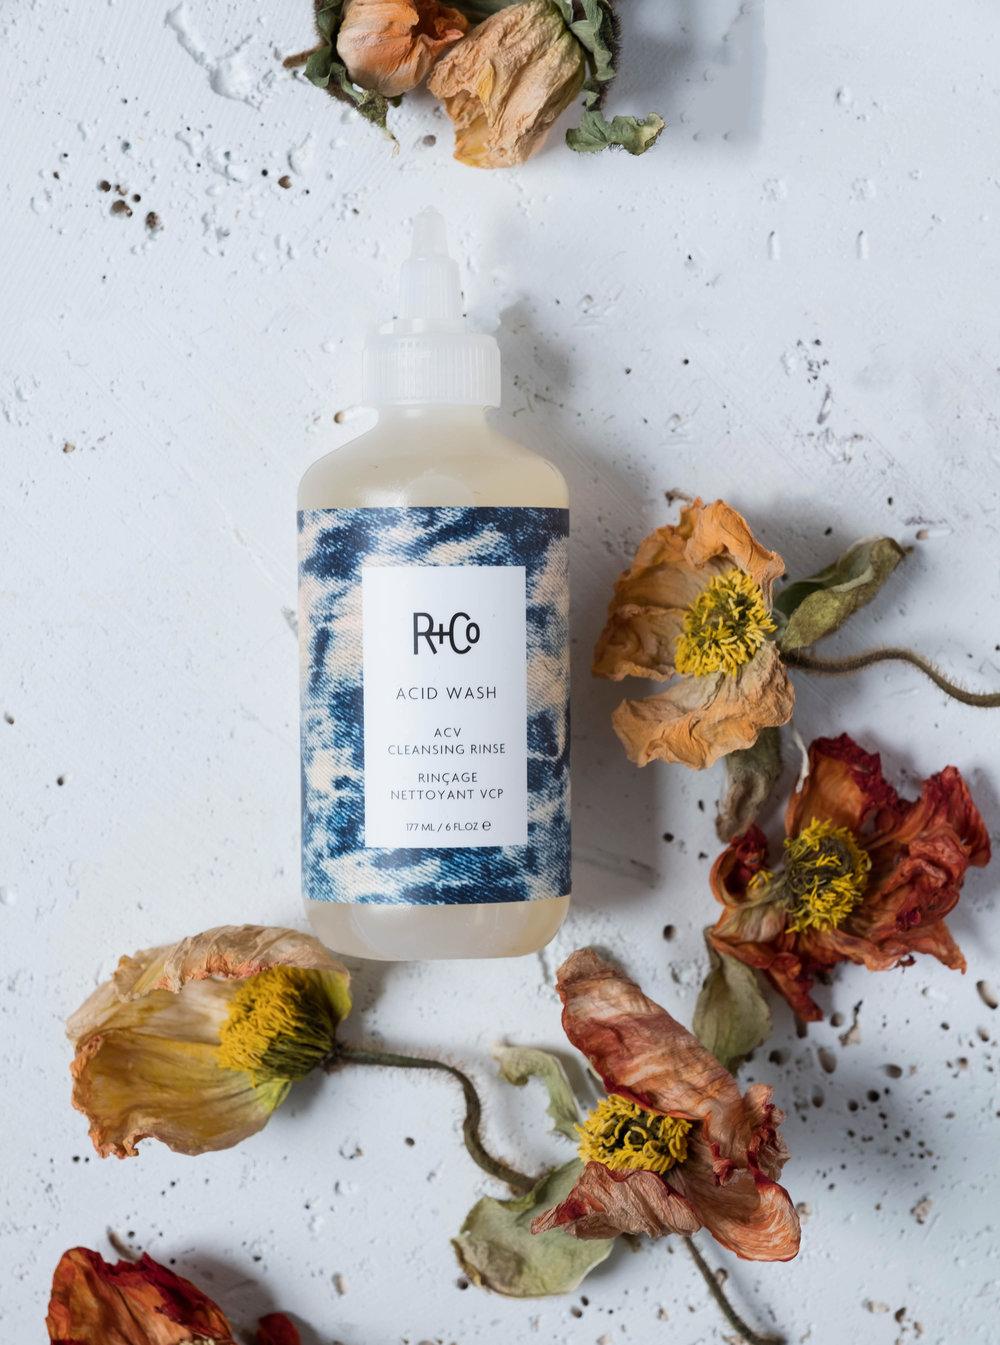 ROSE & IVY Jounal The Secret to Shiny Hair R+Co Acid Wash